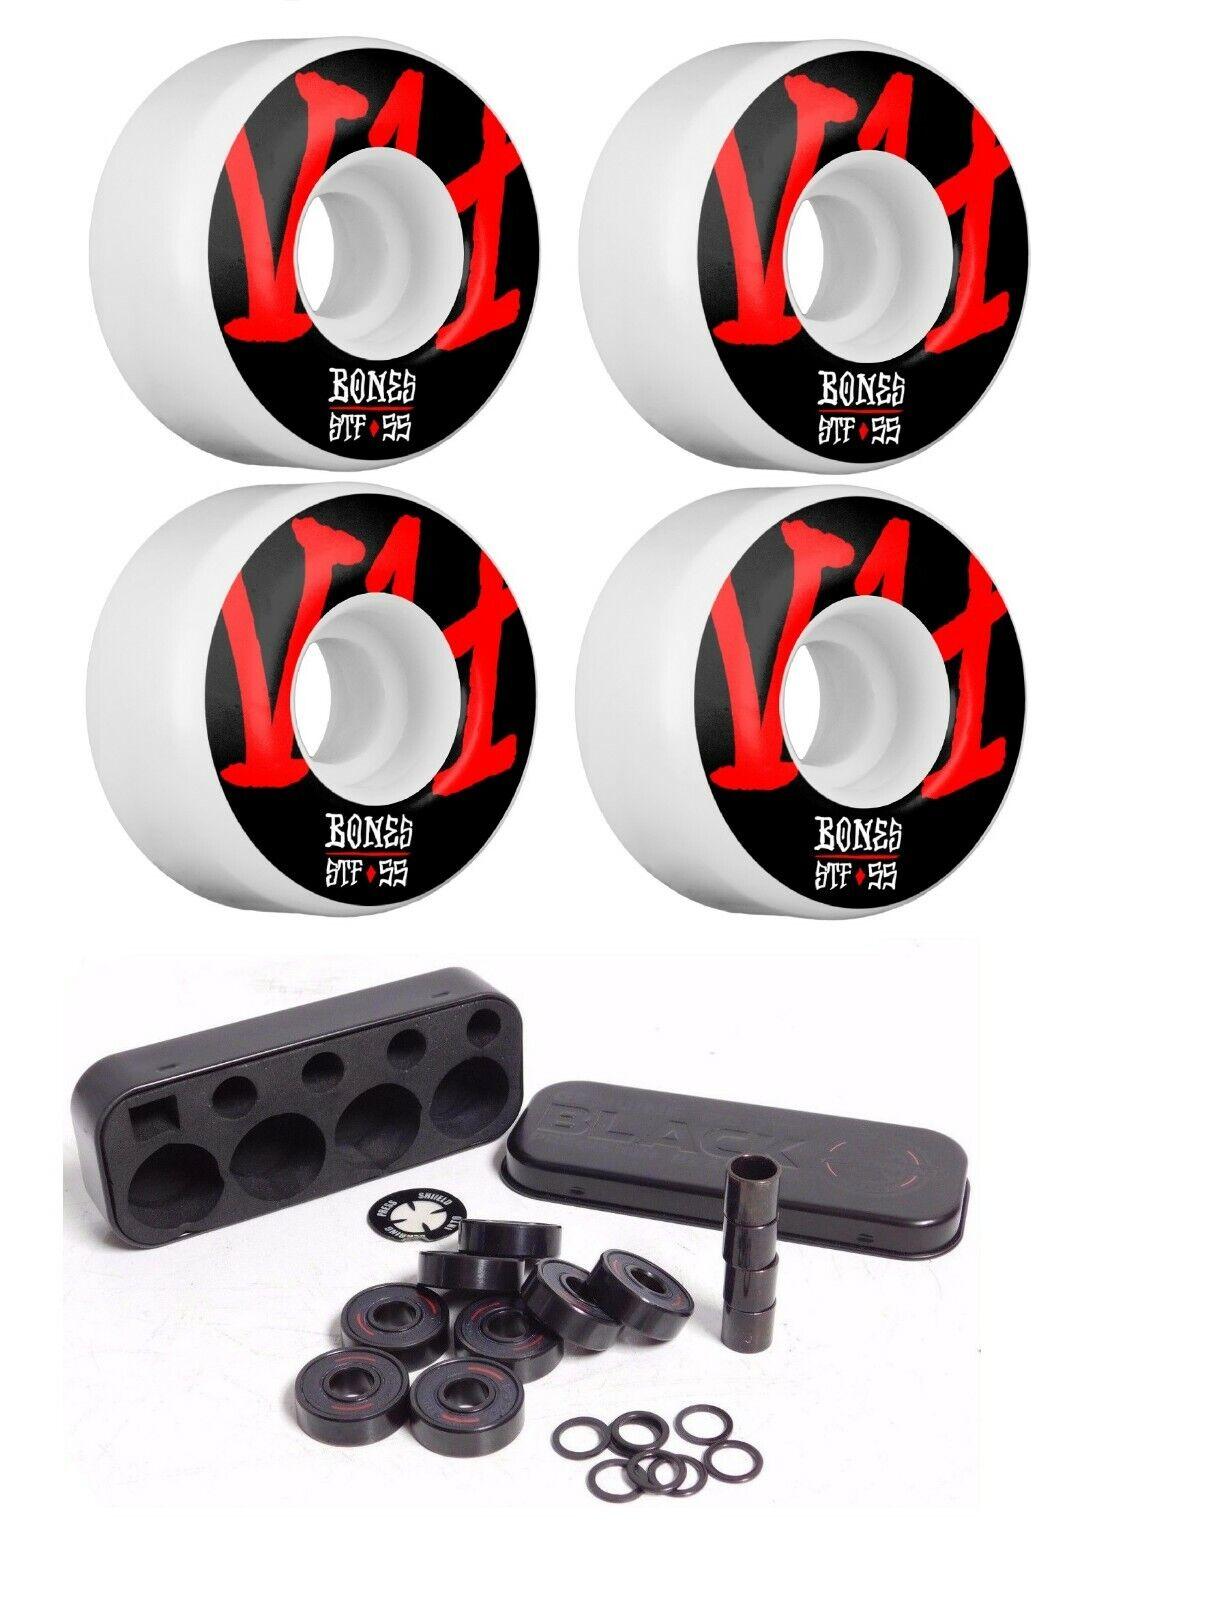 Bones 55mm V4 STF Annuals Skateboard Wheels 103A + Free Inde